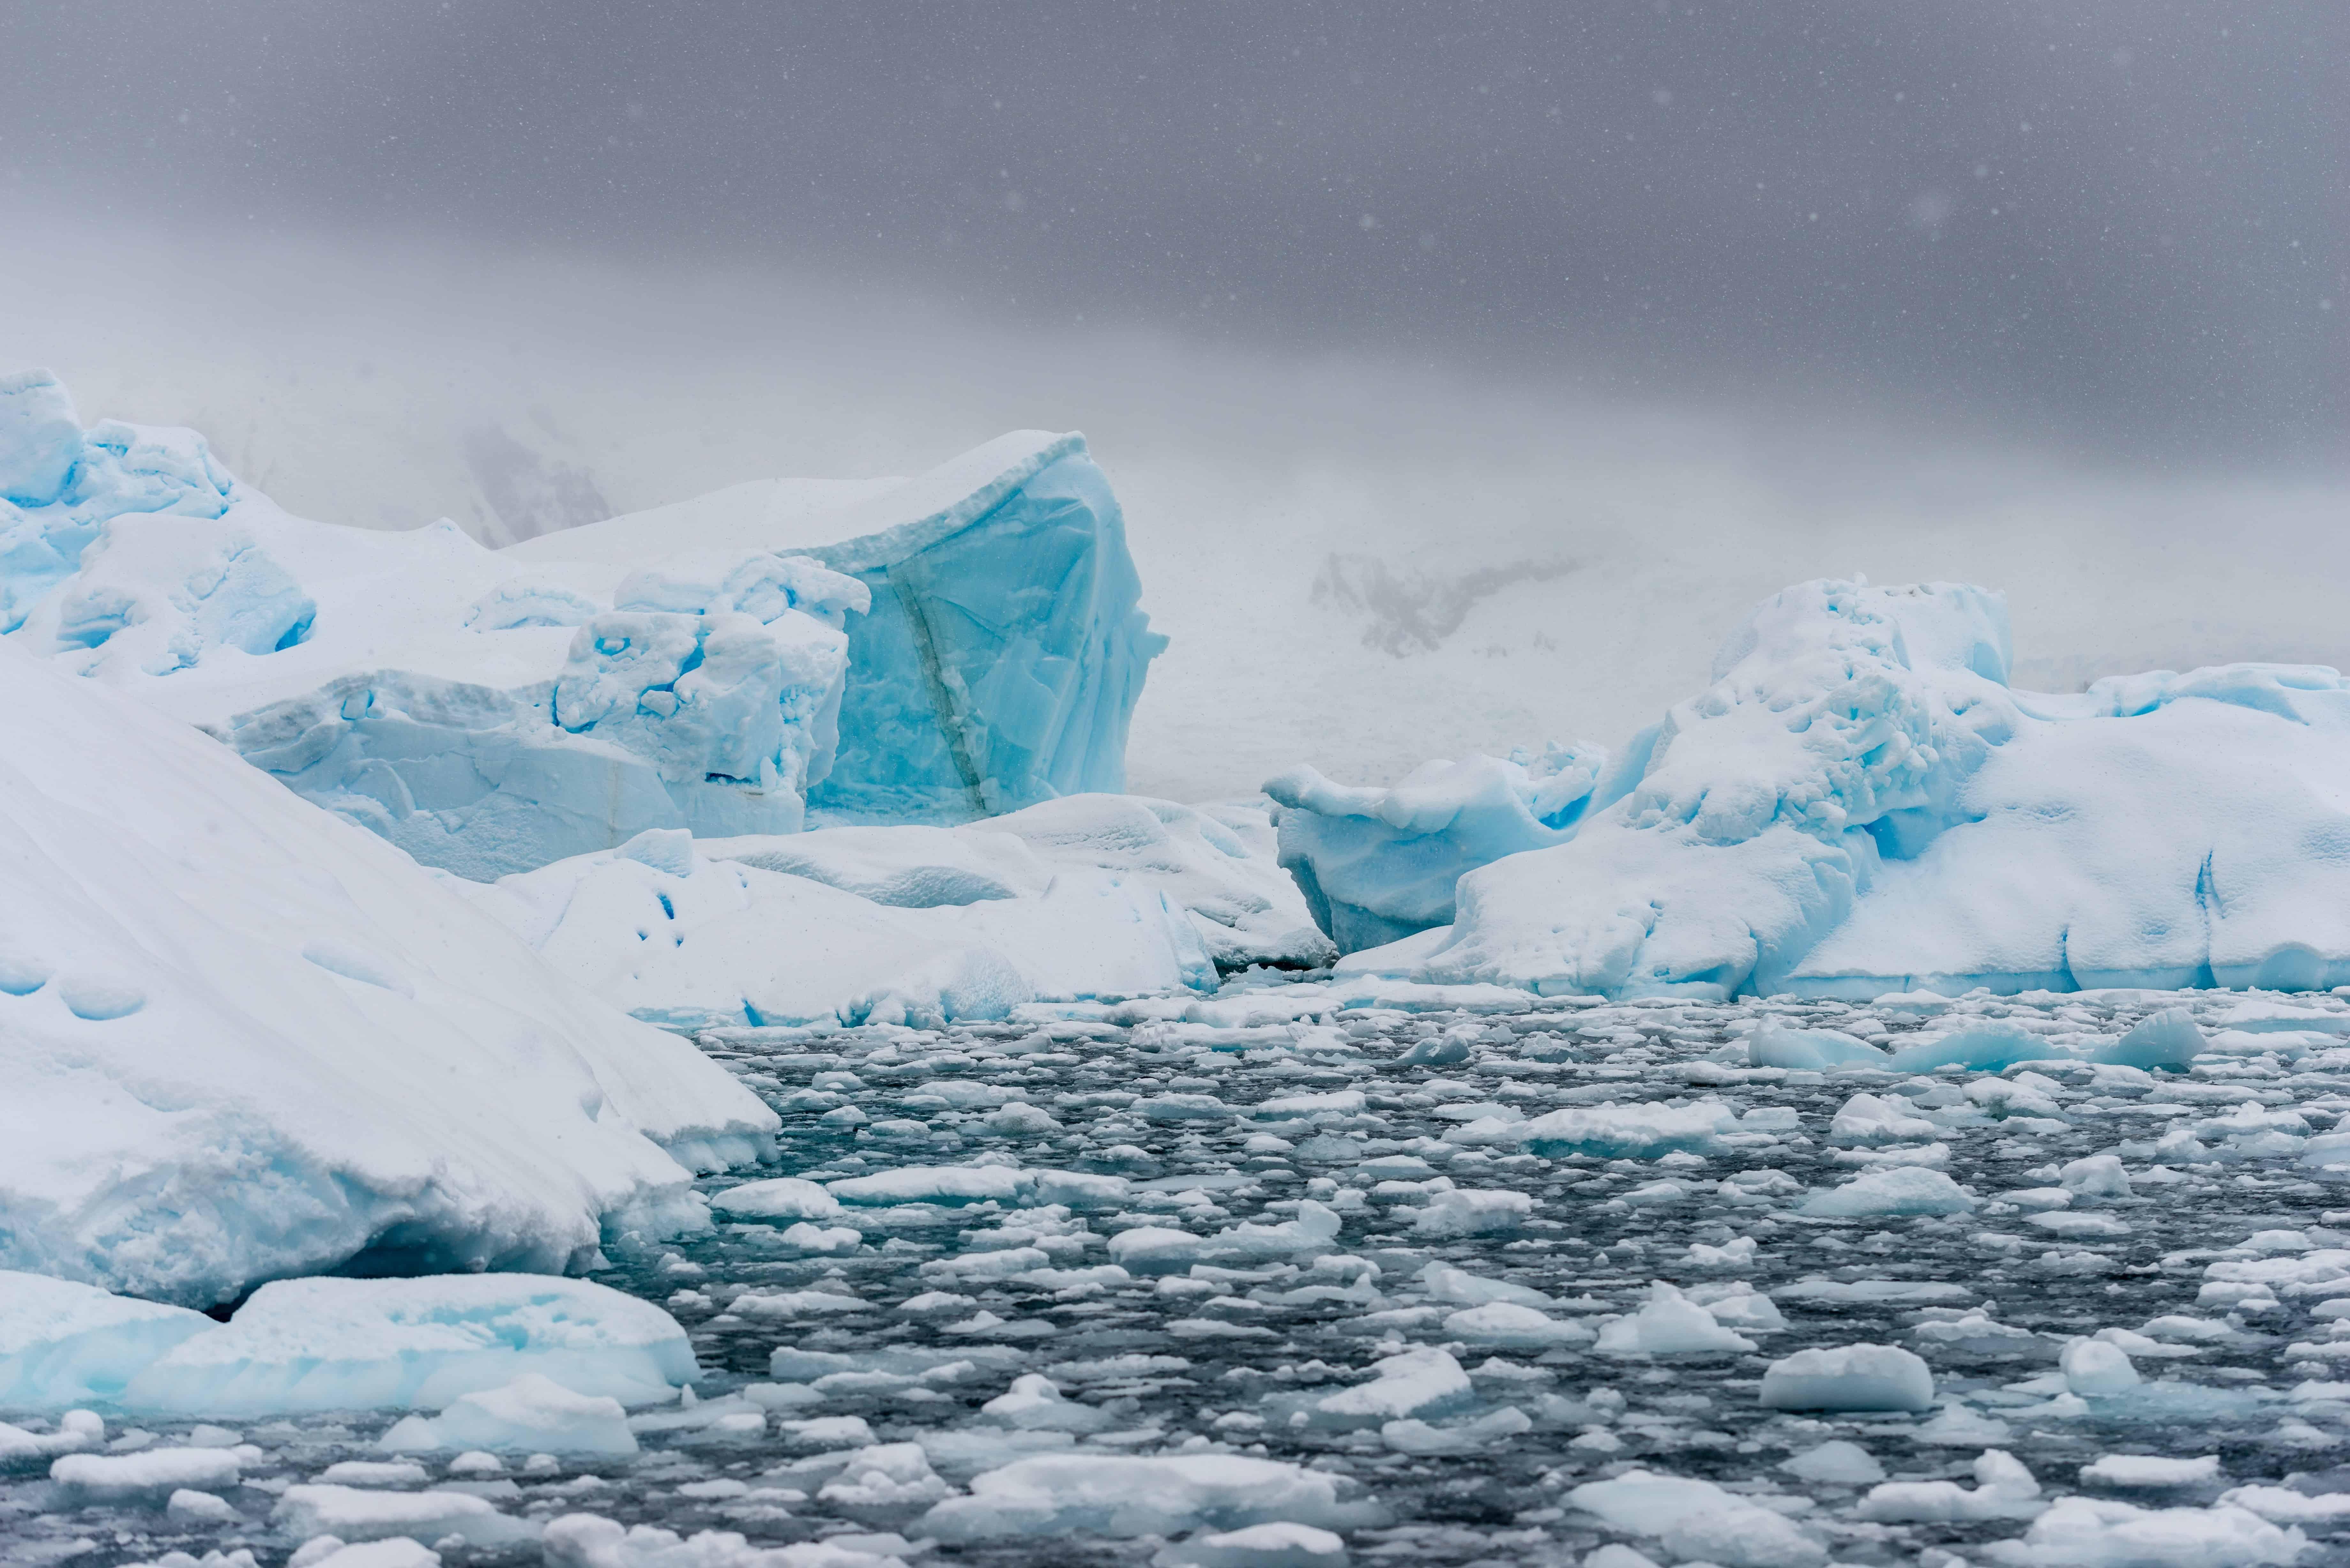 antarctica, global warming, science facts